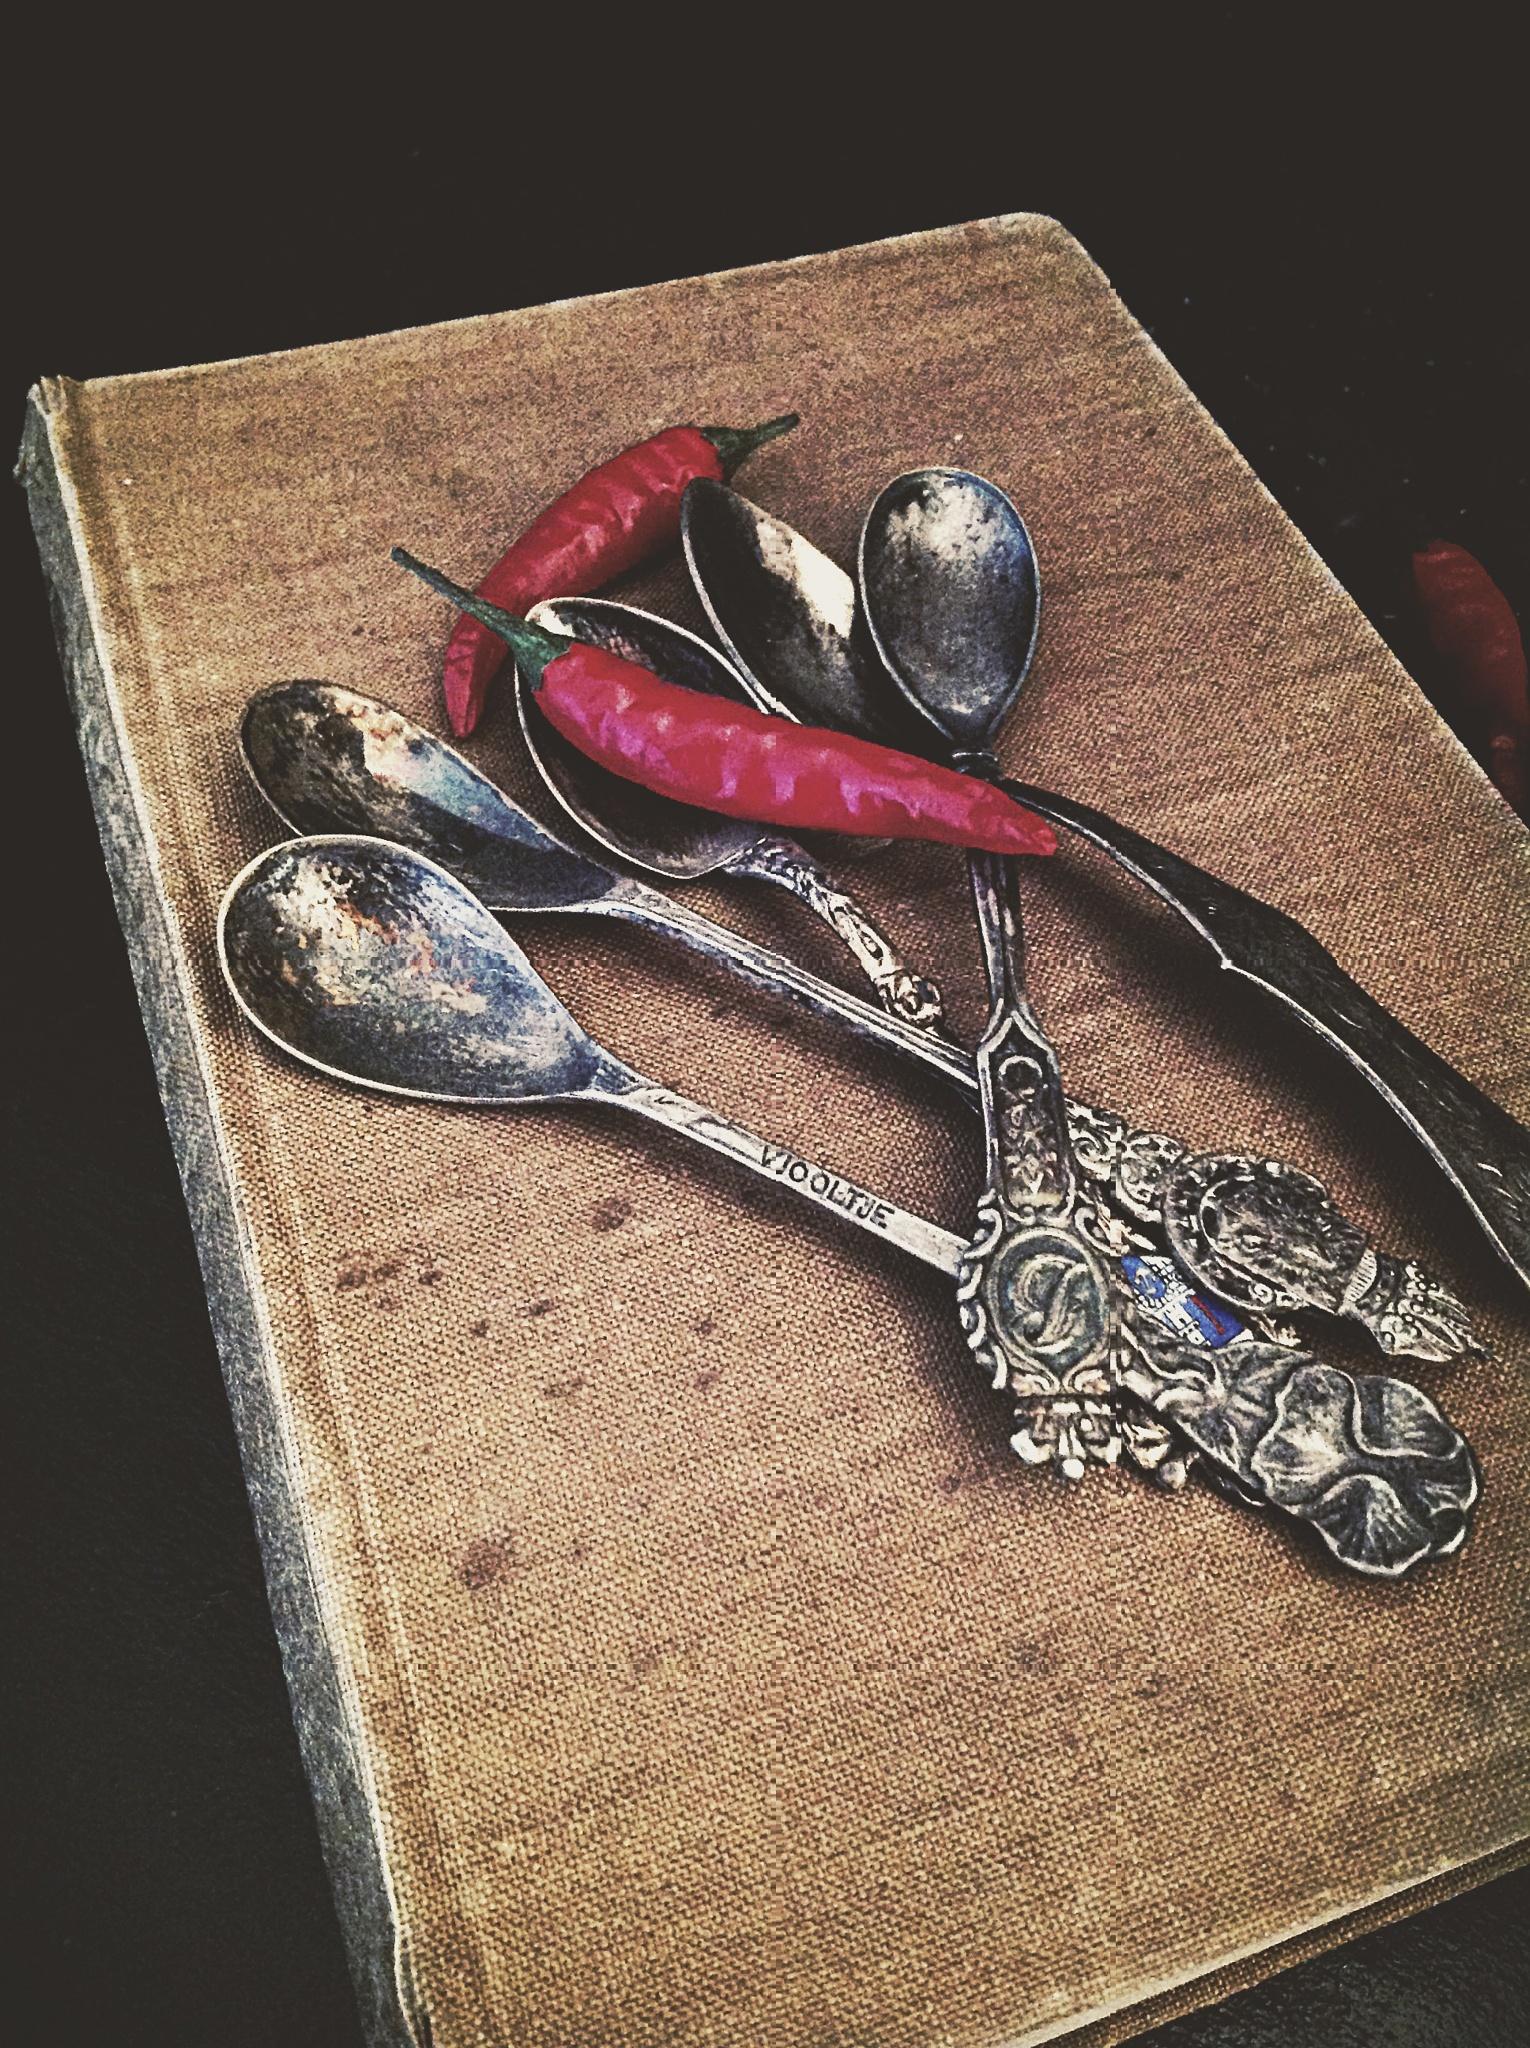 Old cookbook by Christina El Maach